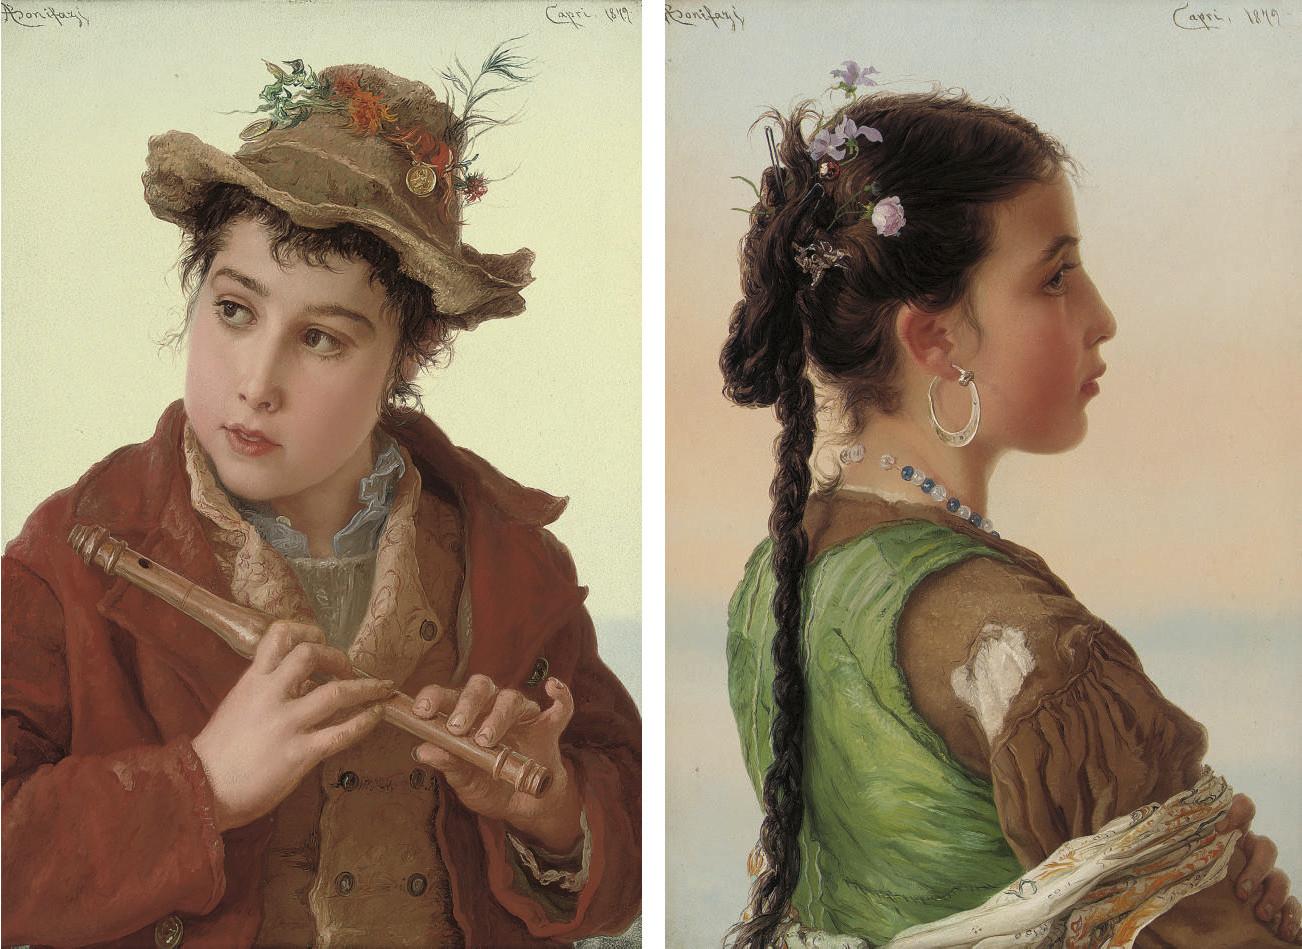 A Capri boy; and A Capri girl